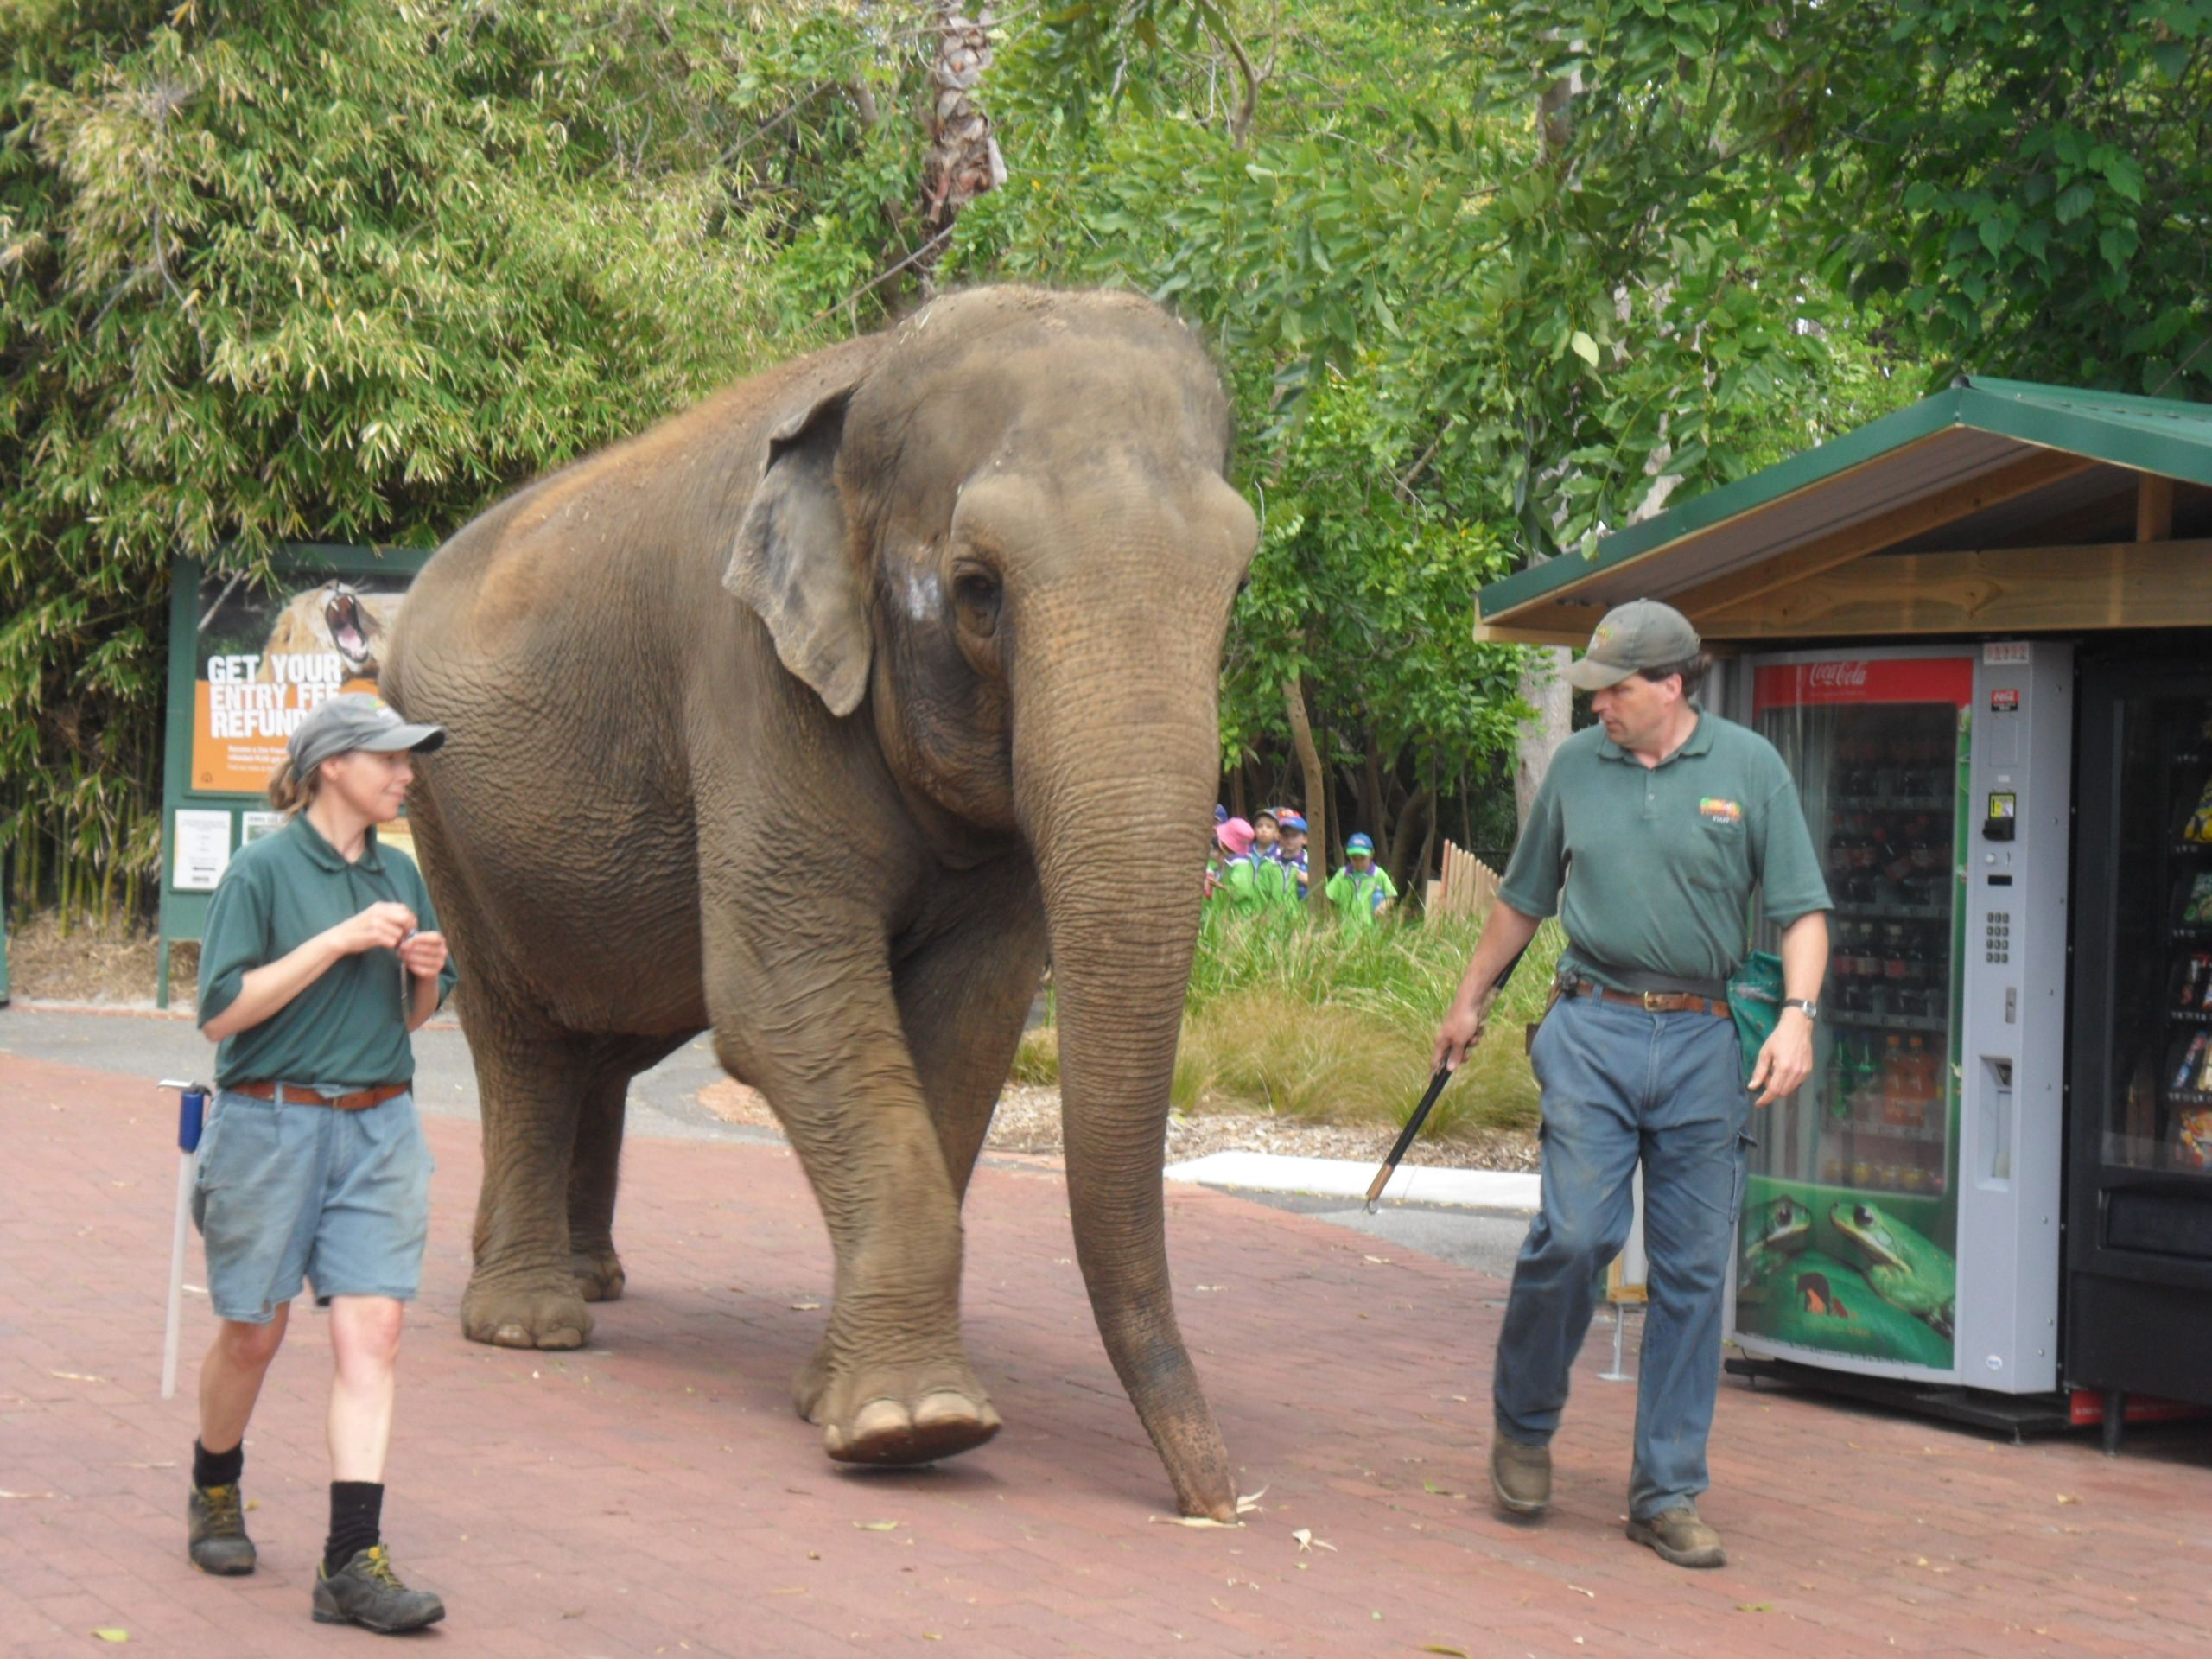 Perth Zoo Western Australia This Is Trisha She S An Old